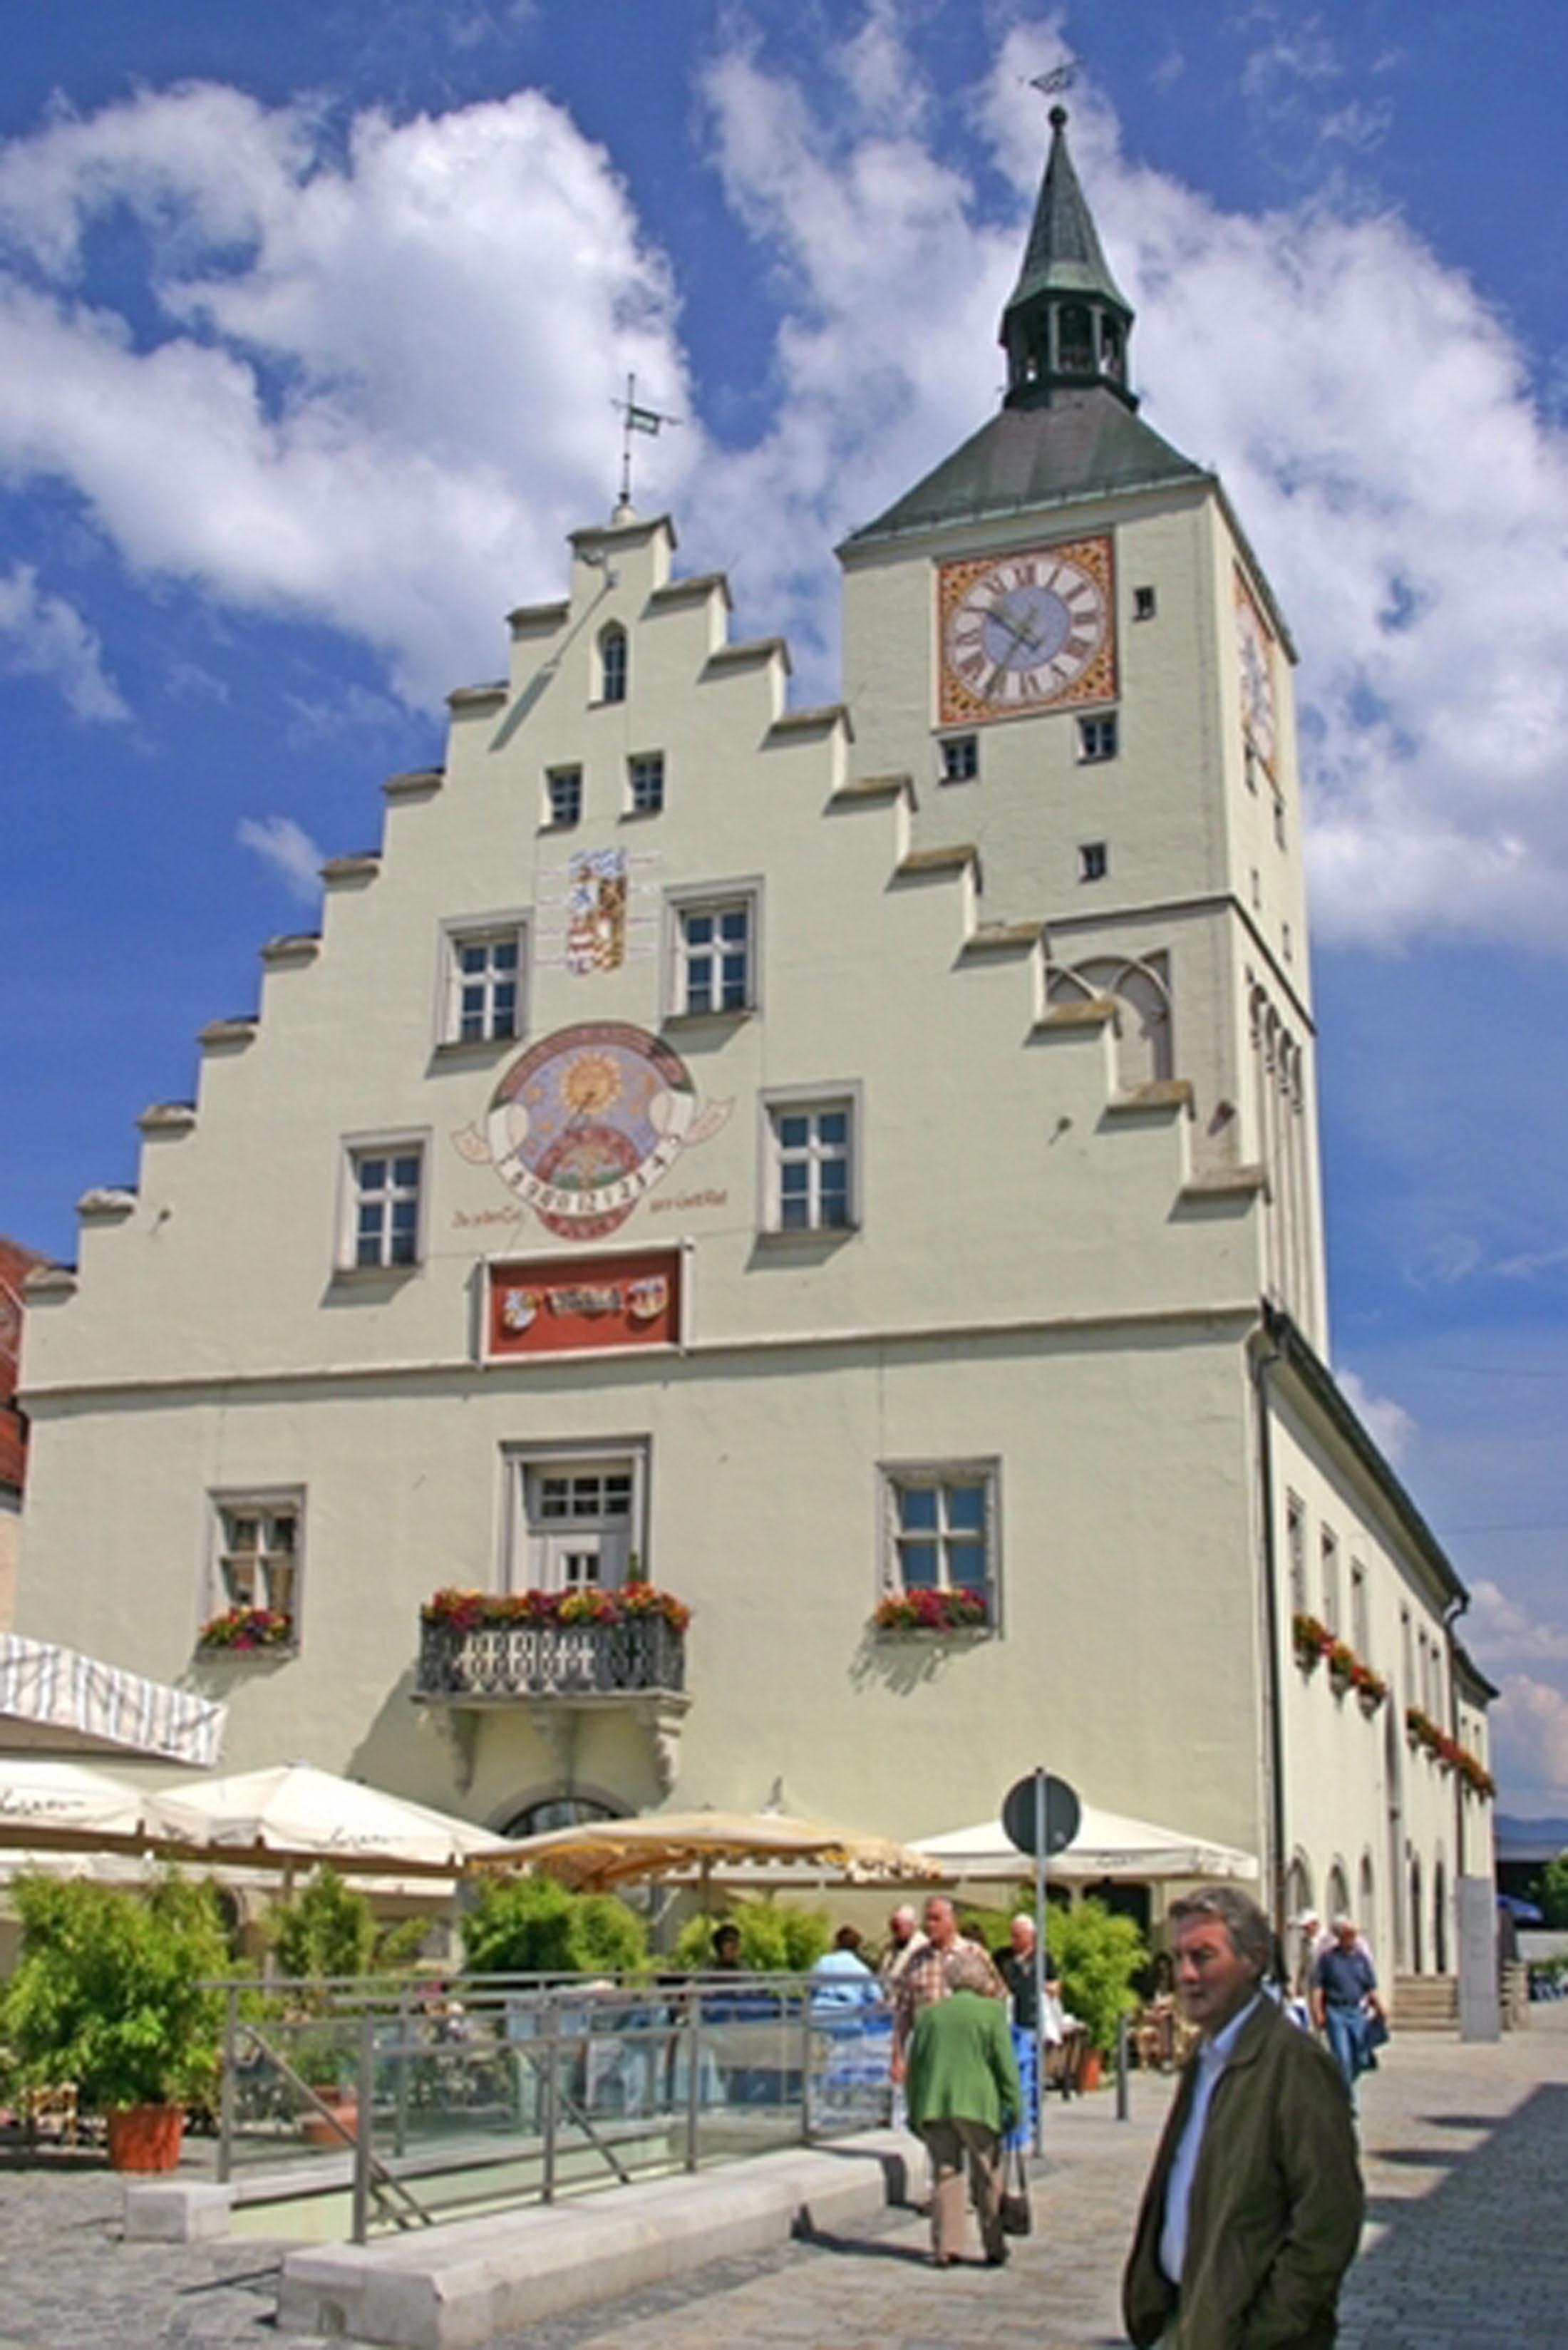 Town hall Deggendorf - Altes Rathaus Deggendorf